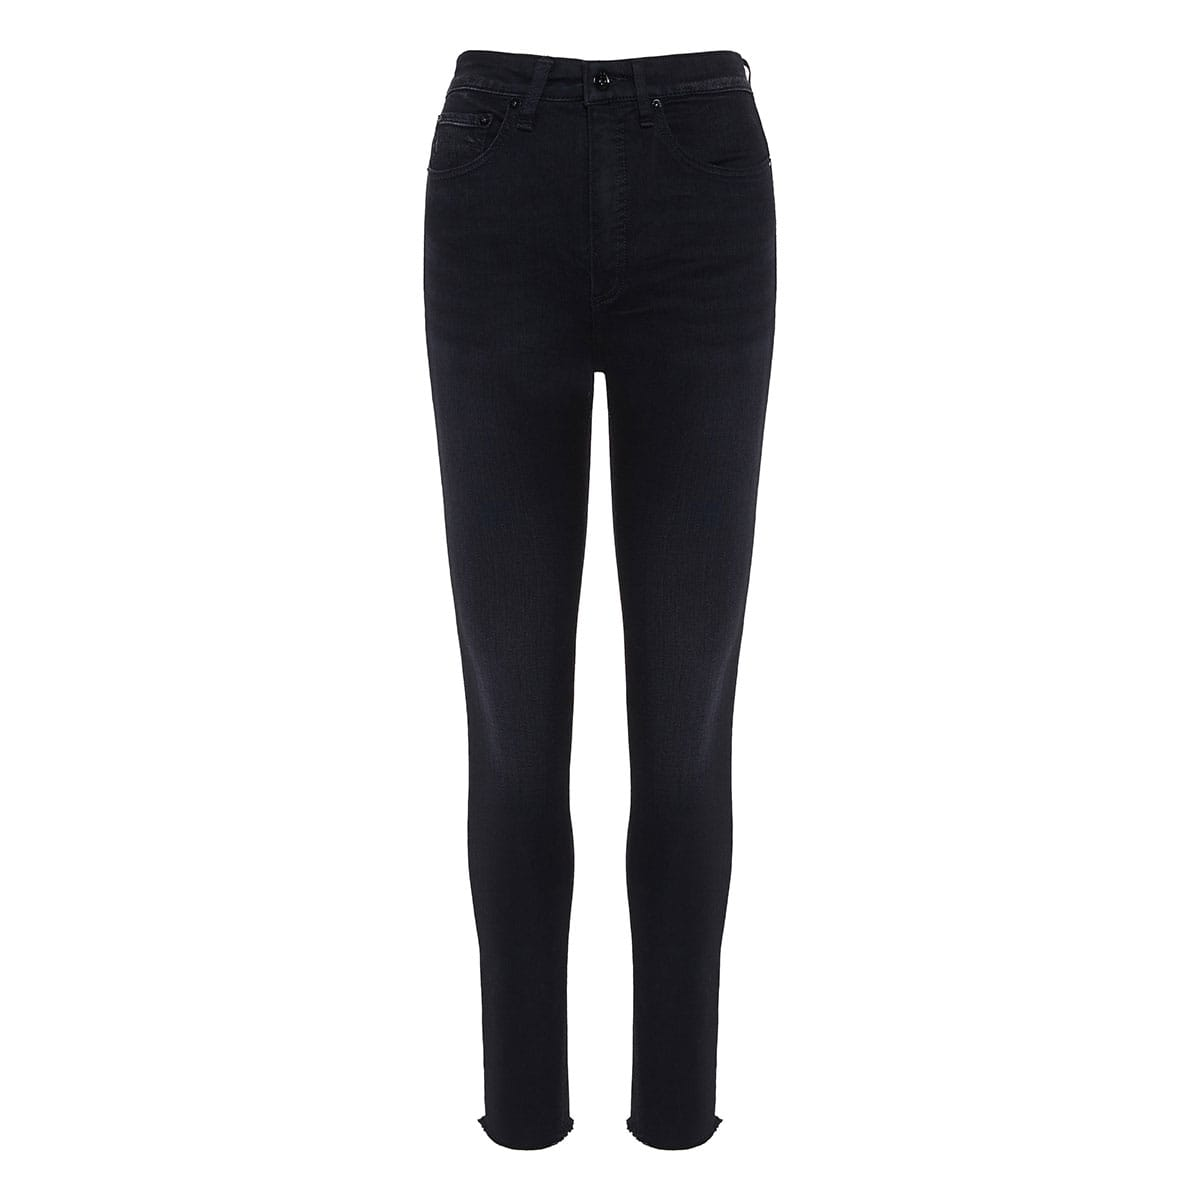 Jane high-waist skinny jeans